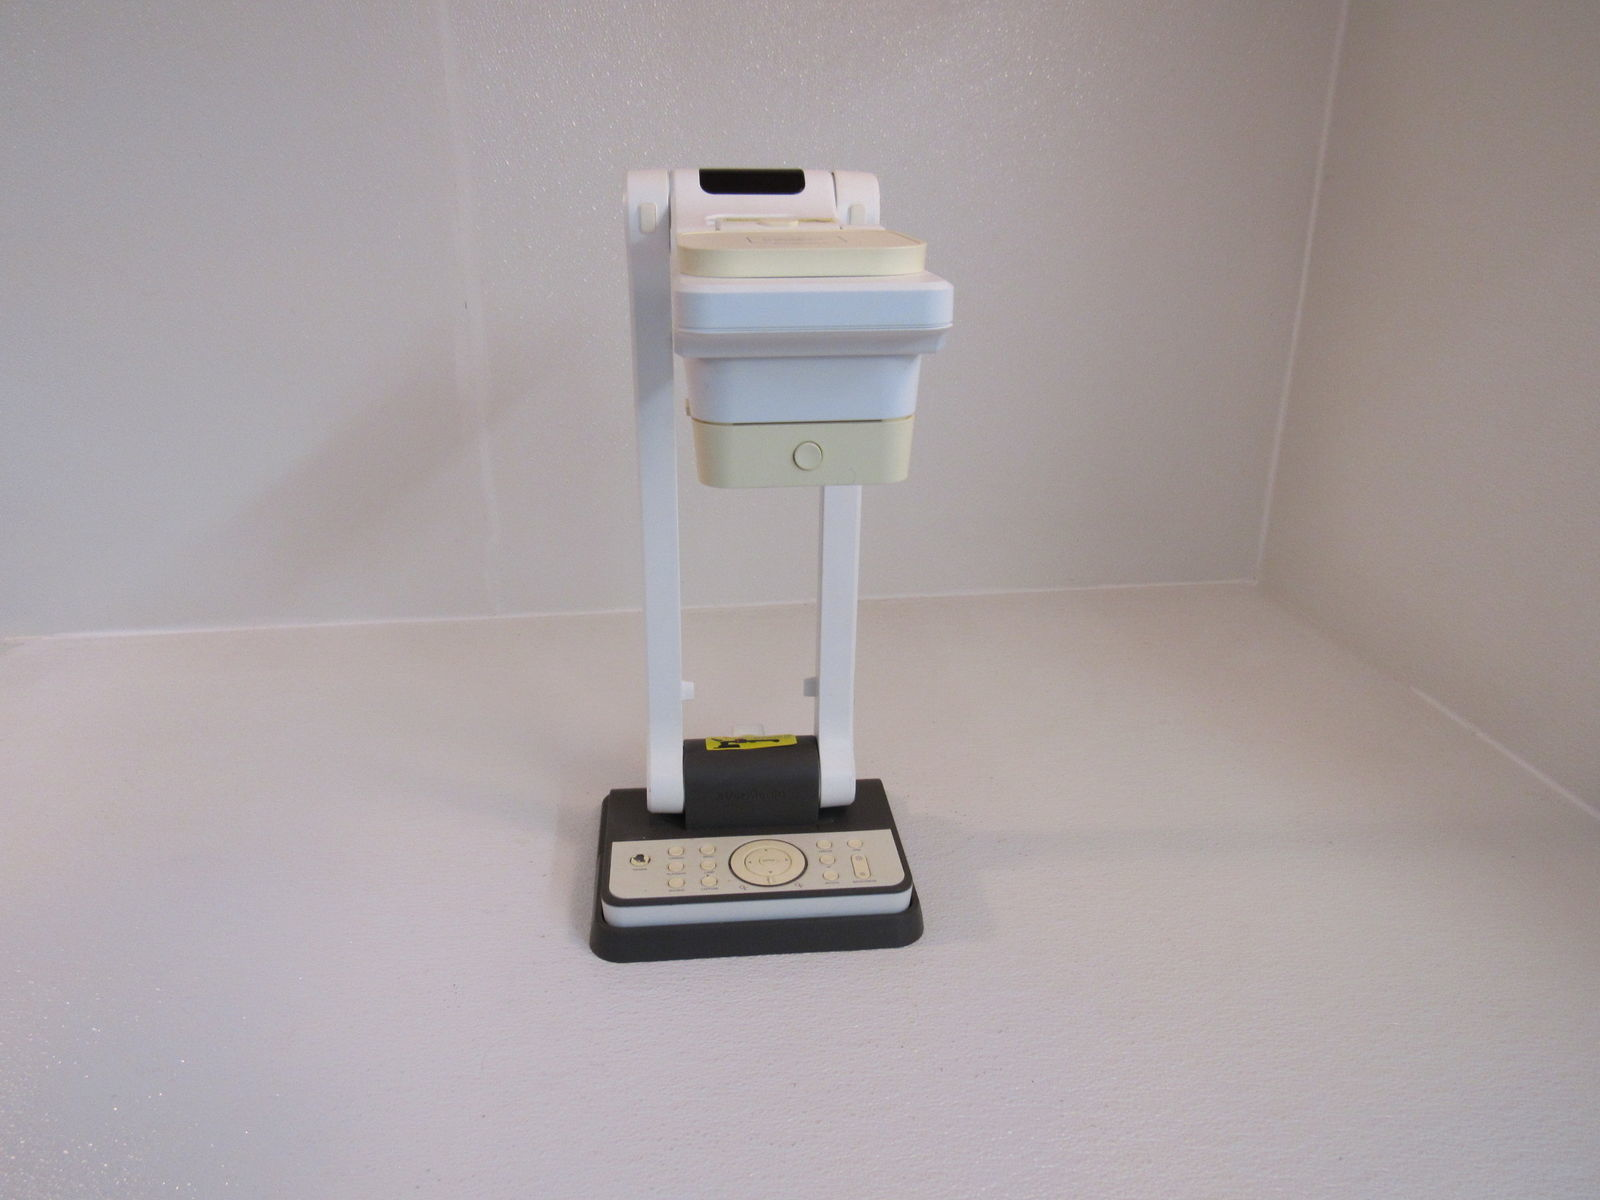 AverMedia Document Camera AverVision 3.2MP 3X Optical Zoom 2X Averzoom SPC300